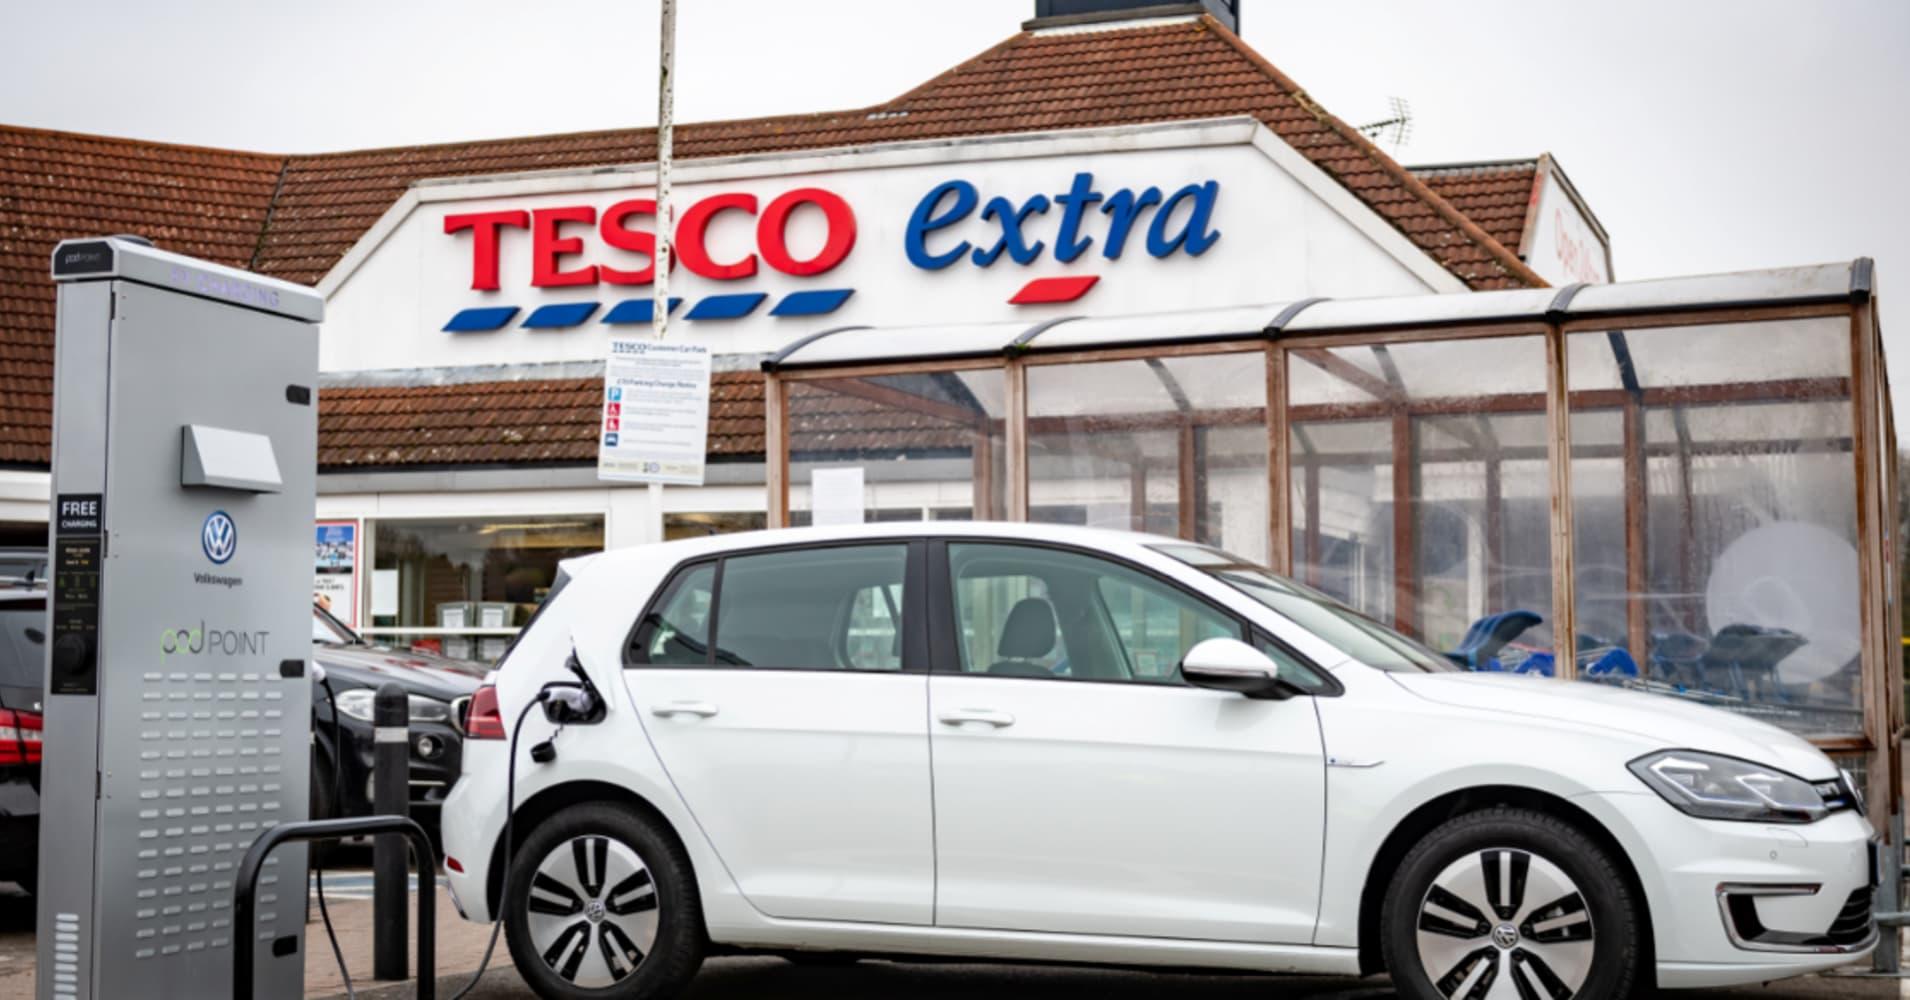 Volkswagen and Tesco to build UK's biggest free car-charging network